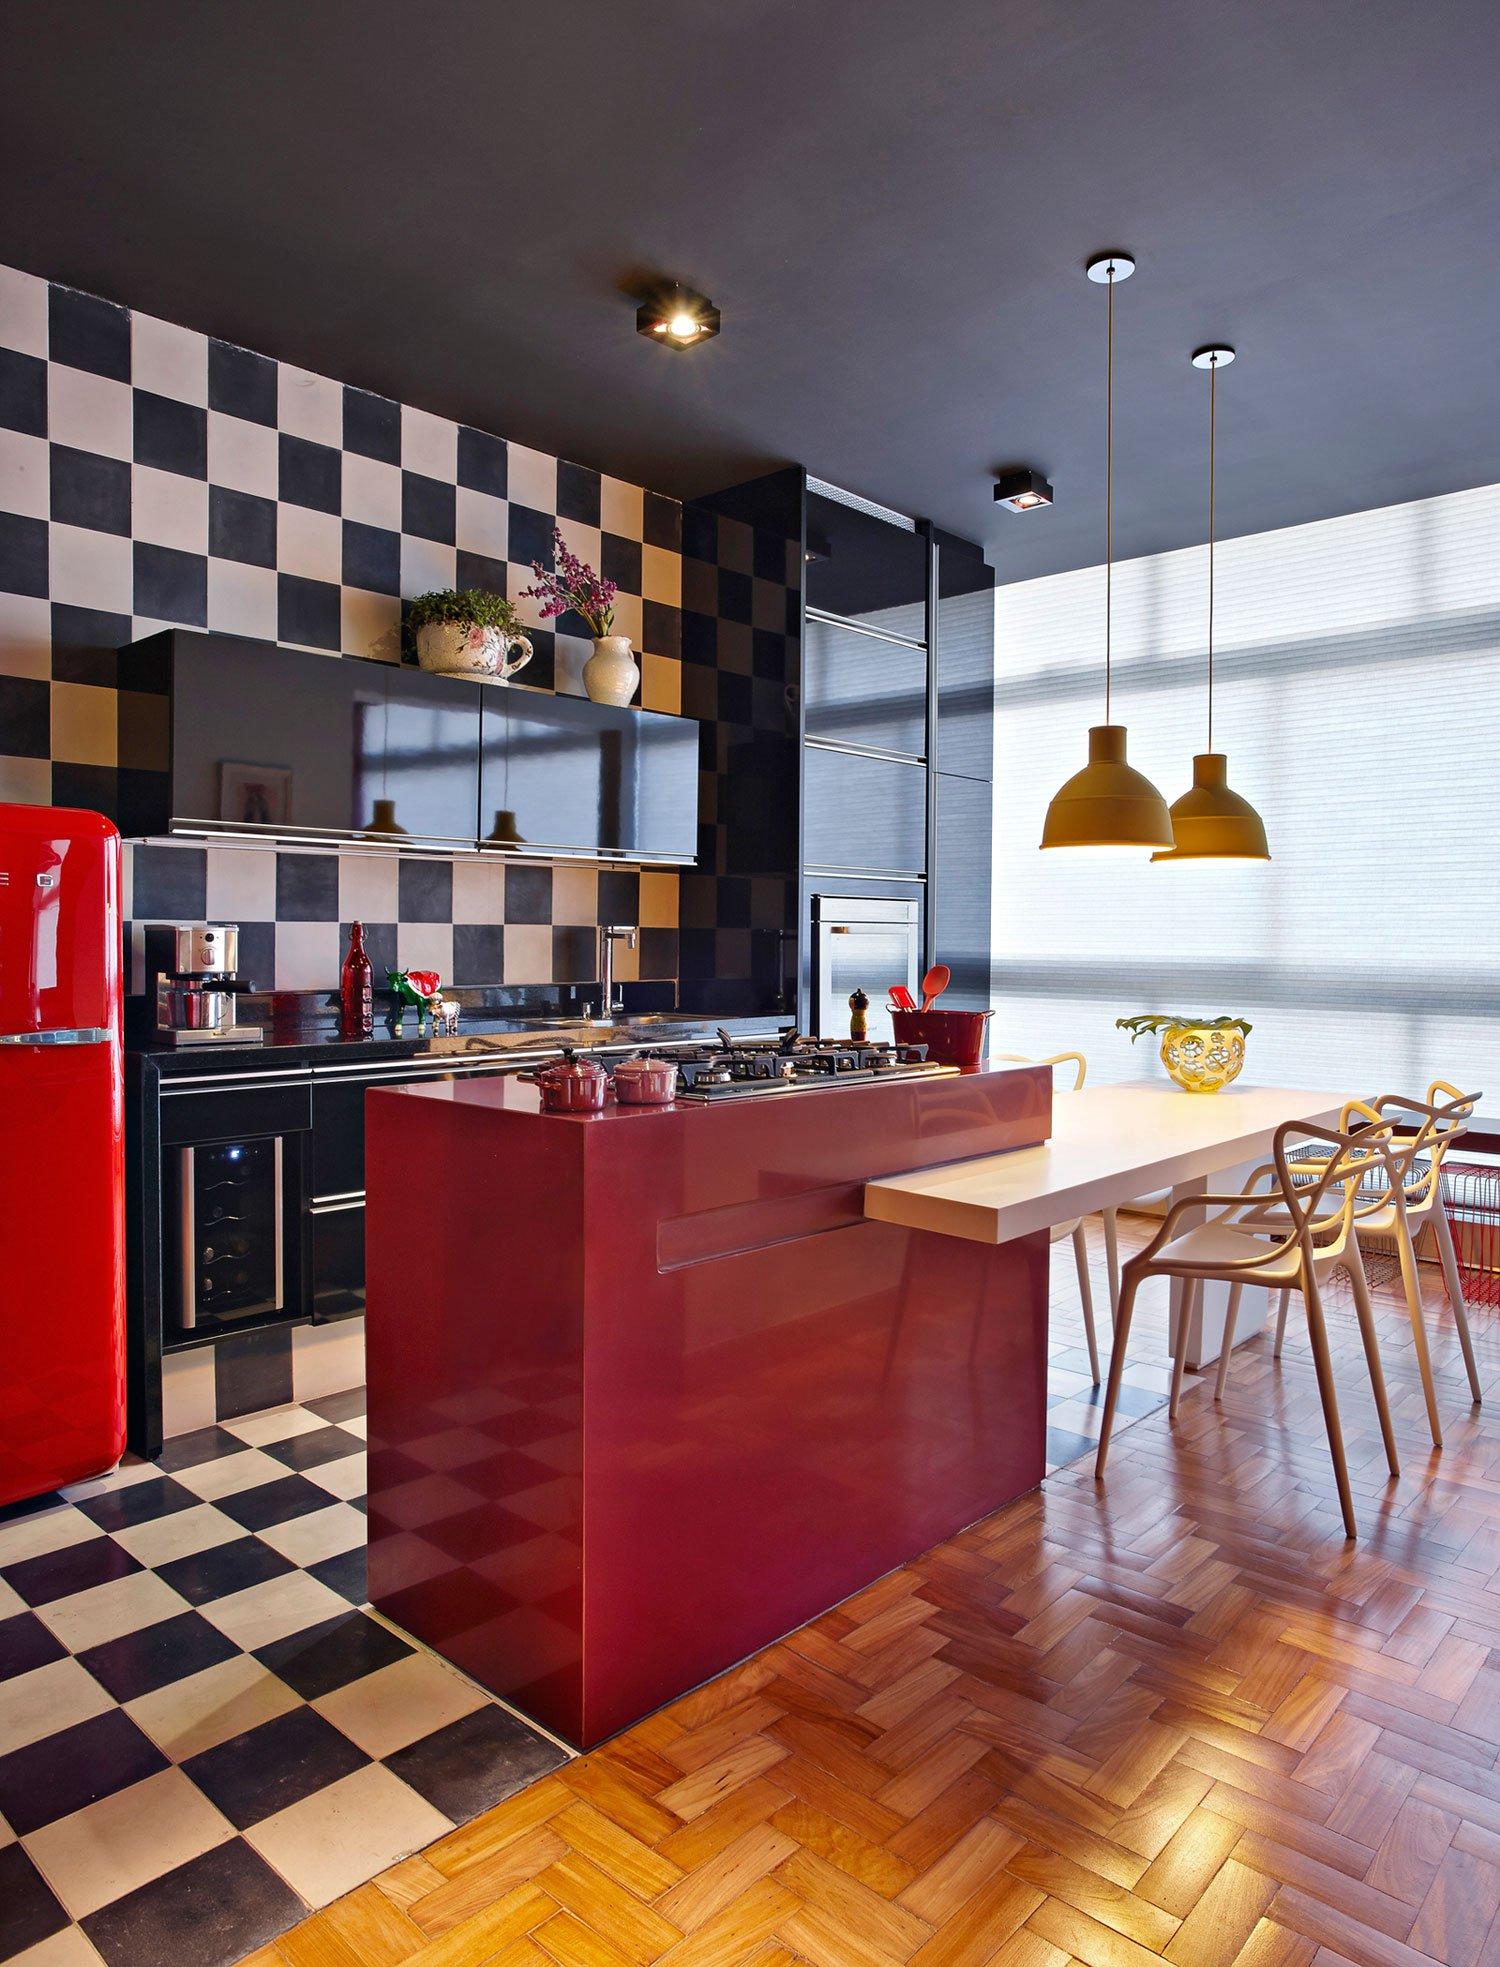 Apartment-in-Belo-Horizonte-08